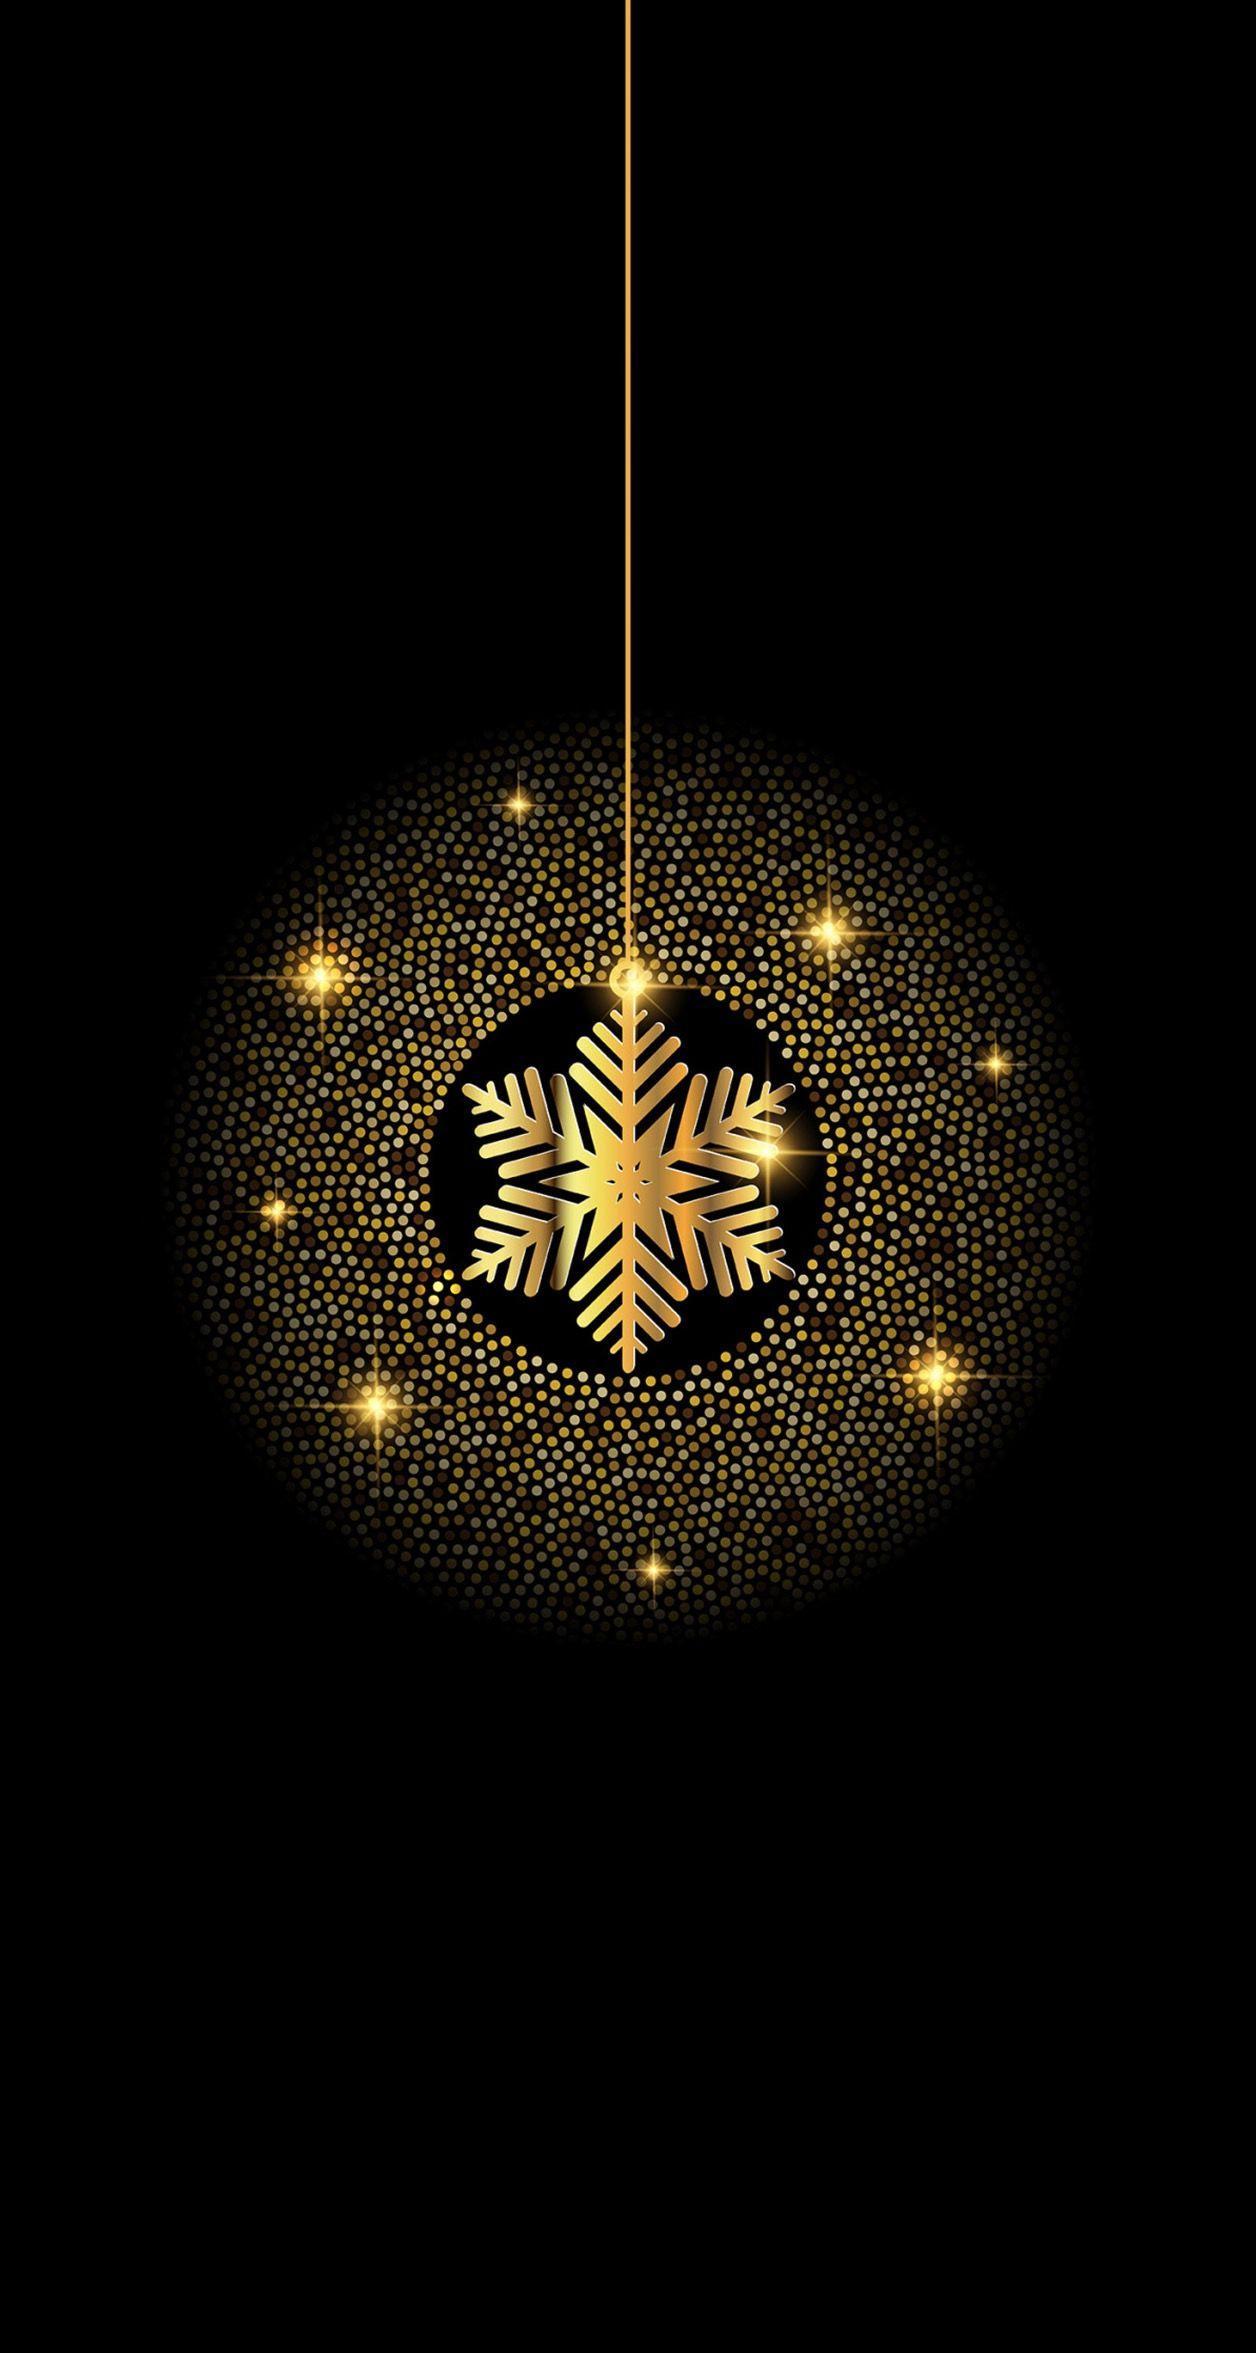 Black And Gold Snowflake Christmas Winter Wonderland